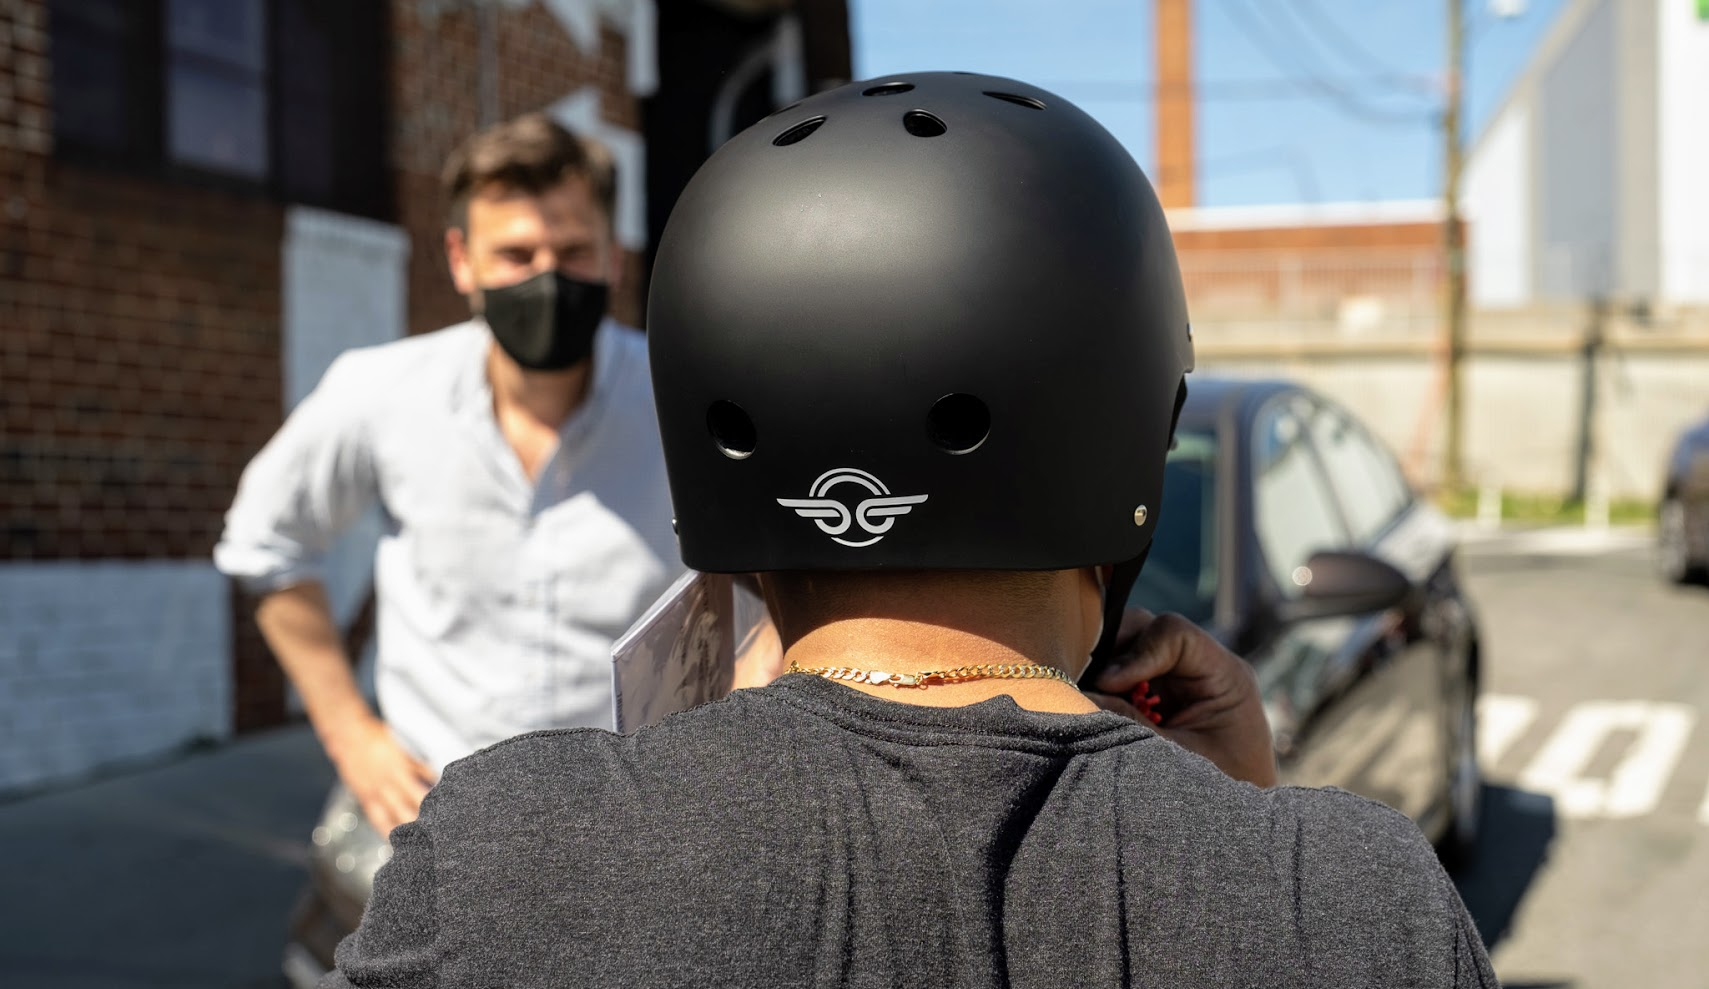 Person wearing helmet with Bird sticker on back